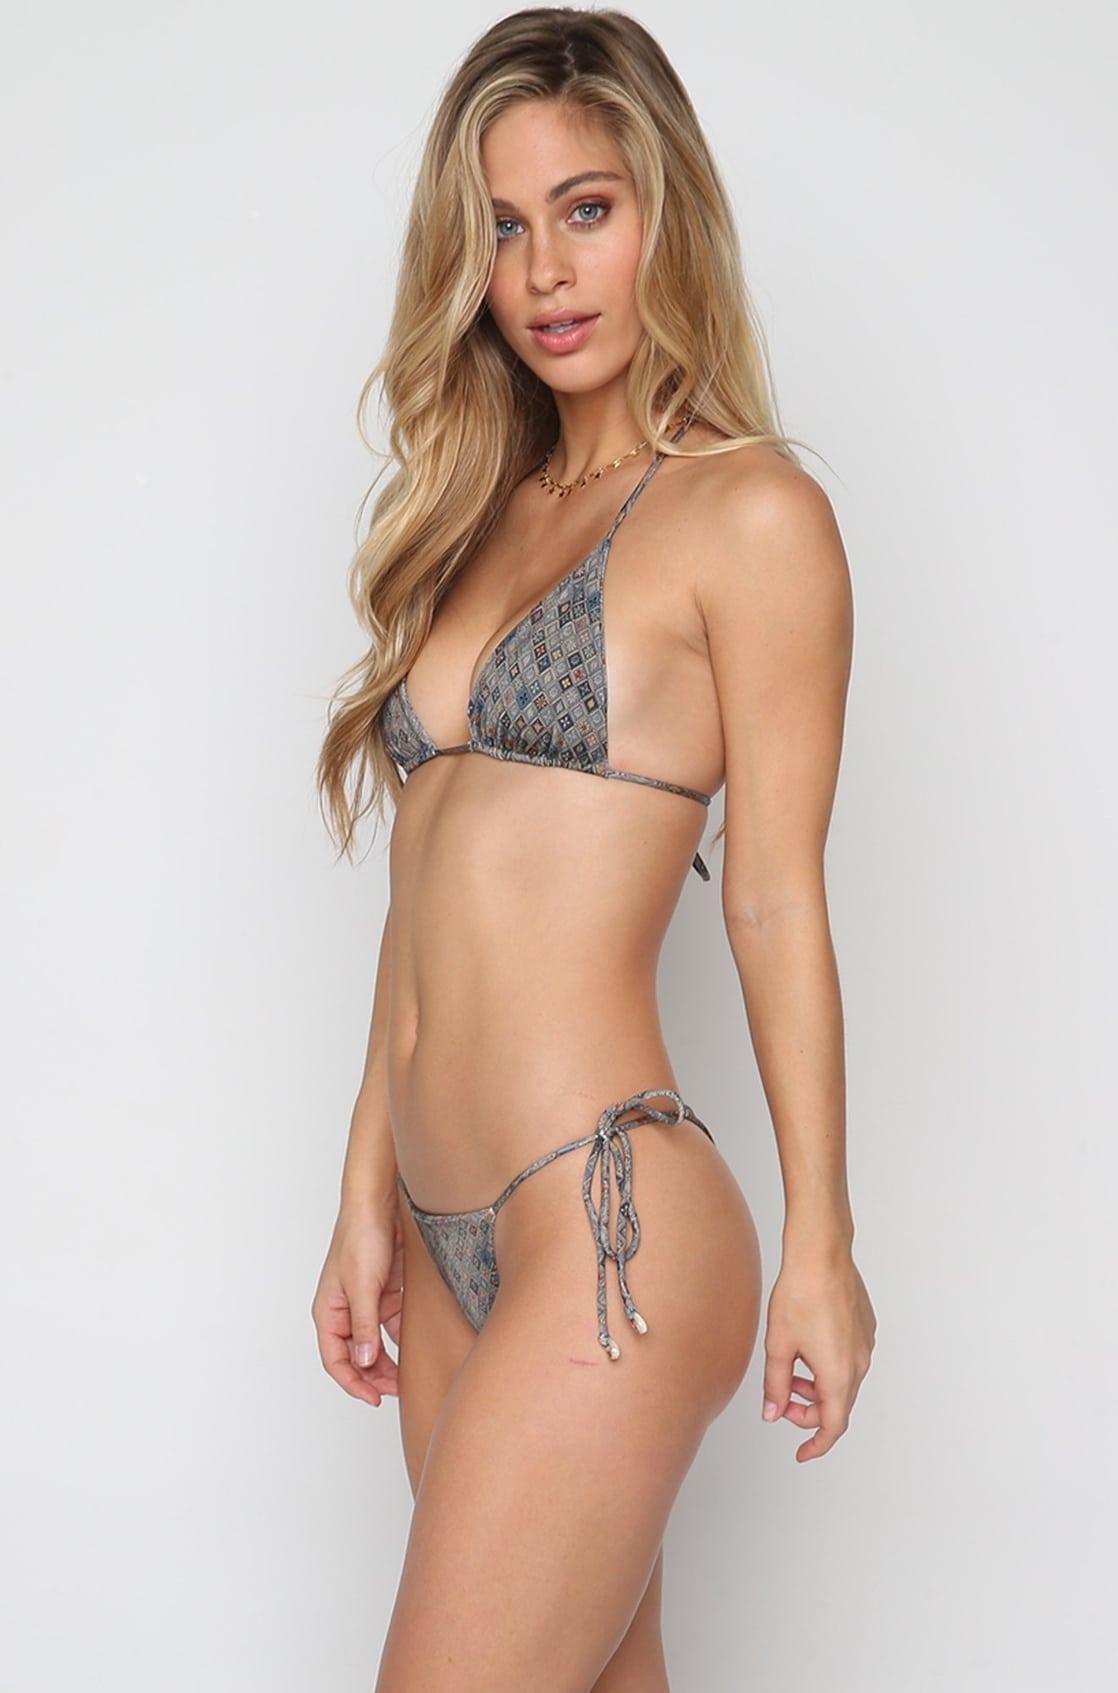 Youtube Ciara Lebamoff naked (95 photos), Ass, Fappening, Selfie, butt 2006